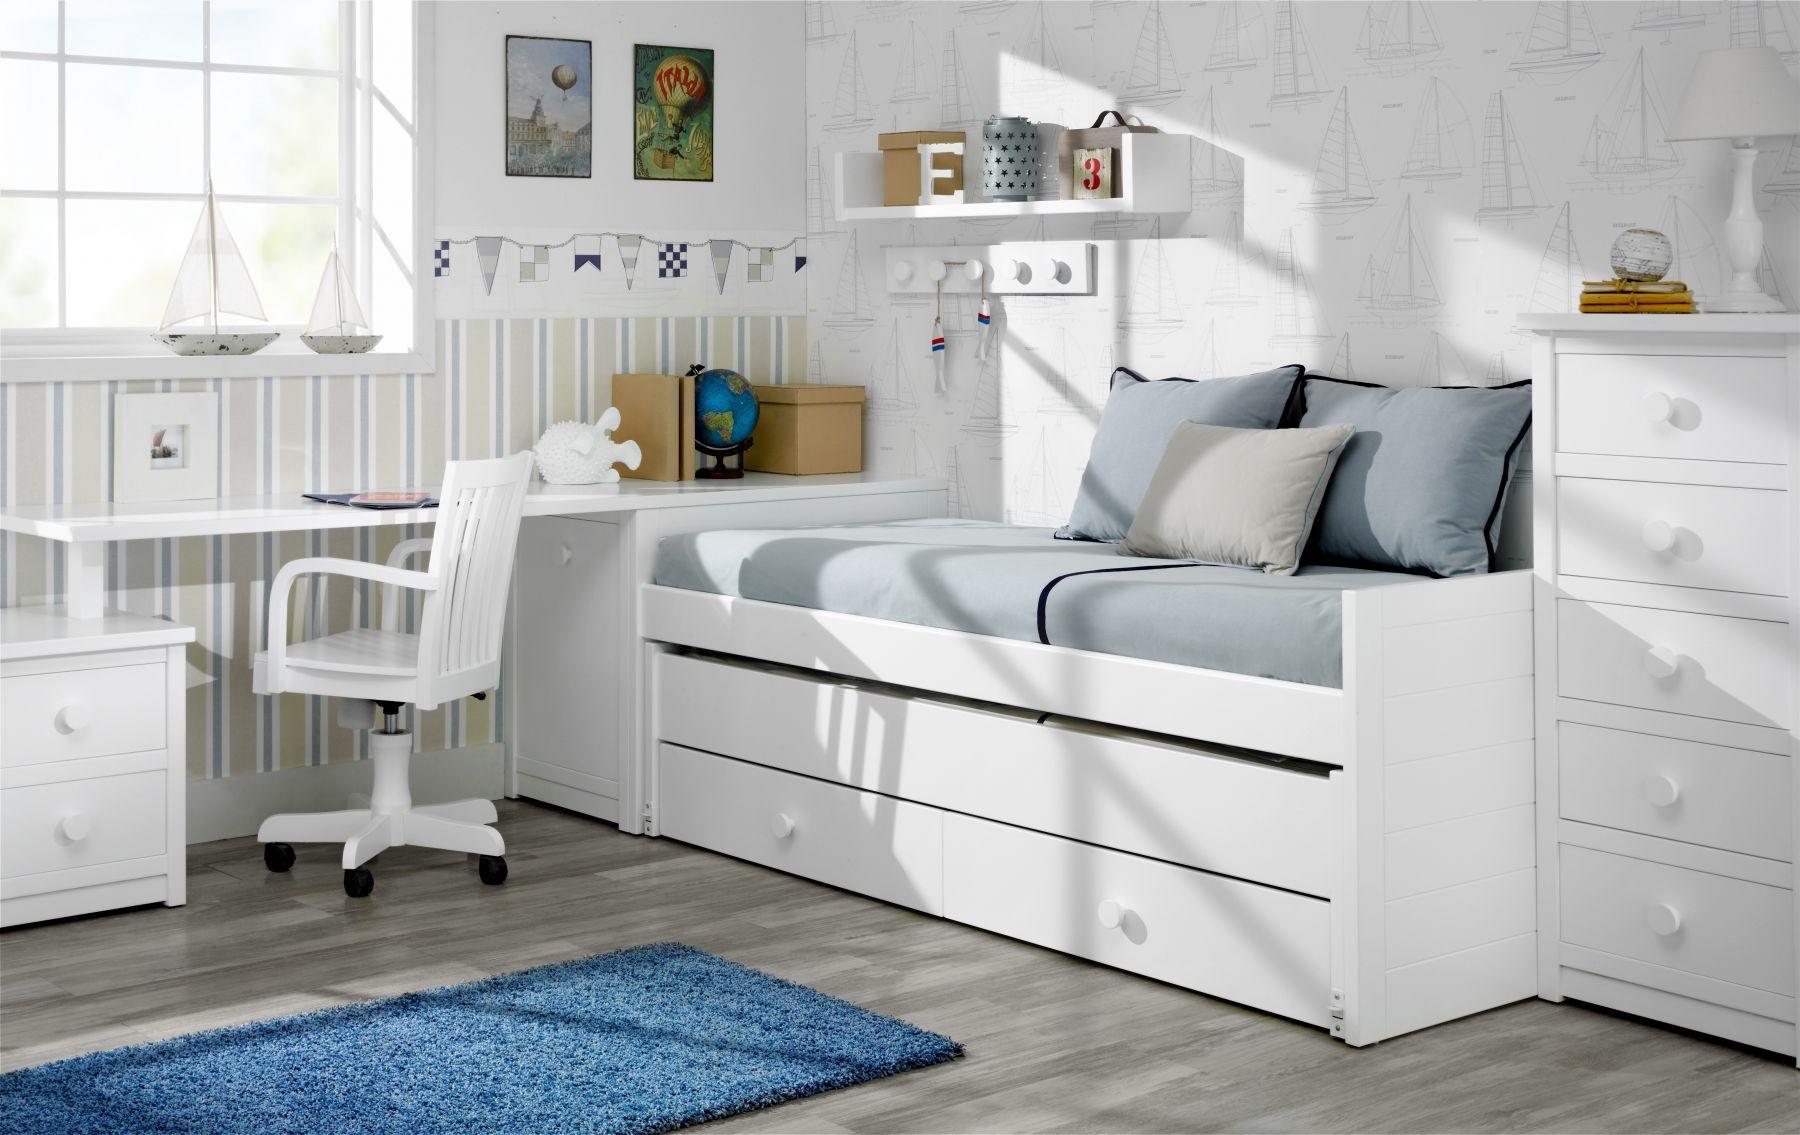 Garabatos Tiendas de Mobiliario Juvenil e Infantil Dormitorios